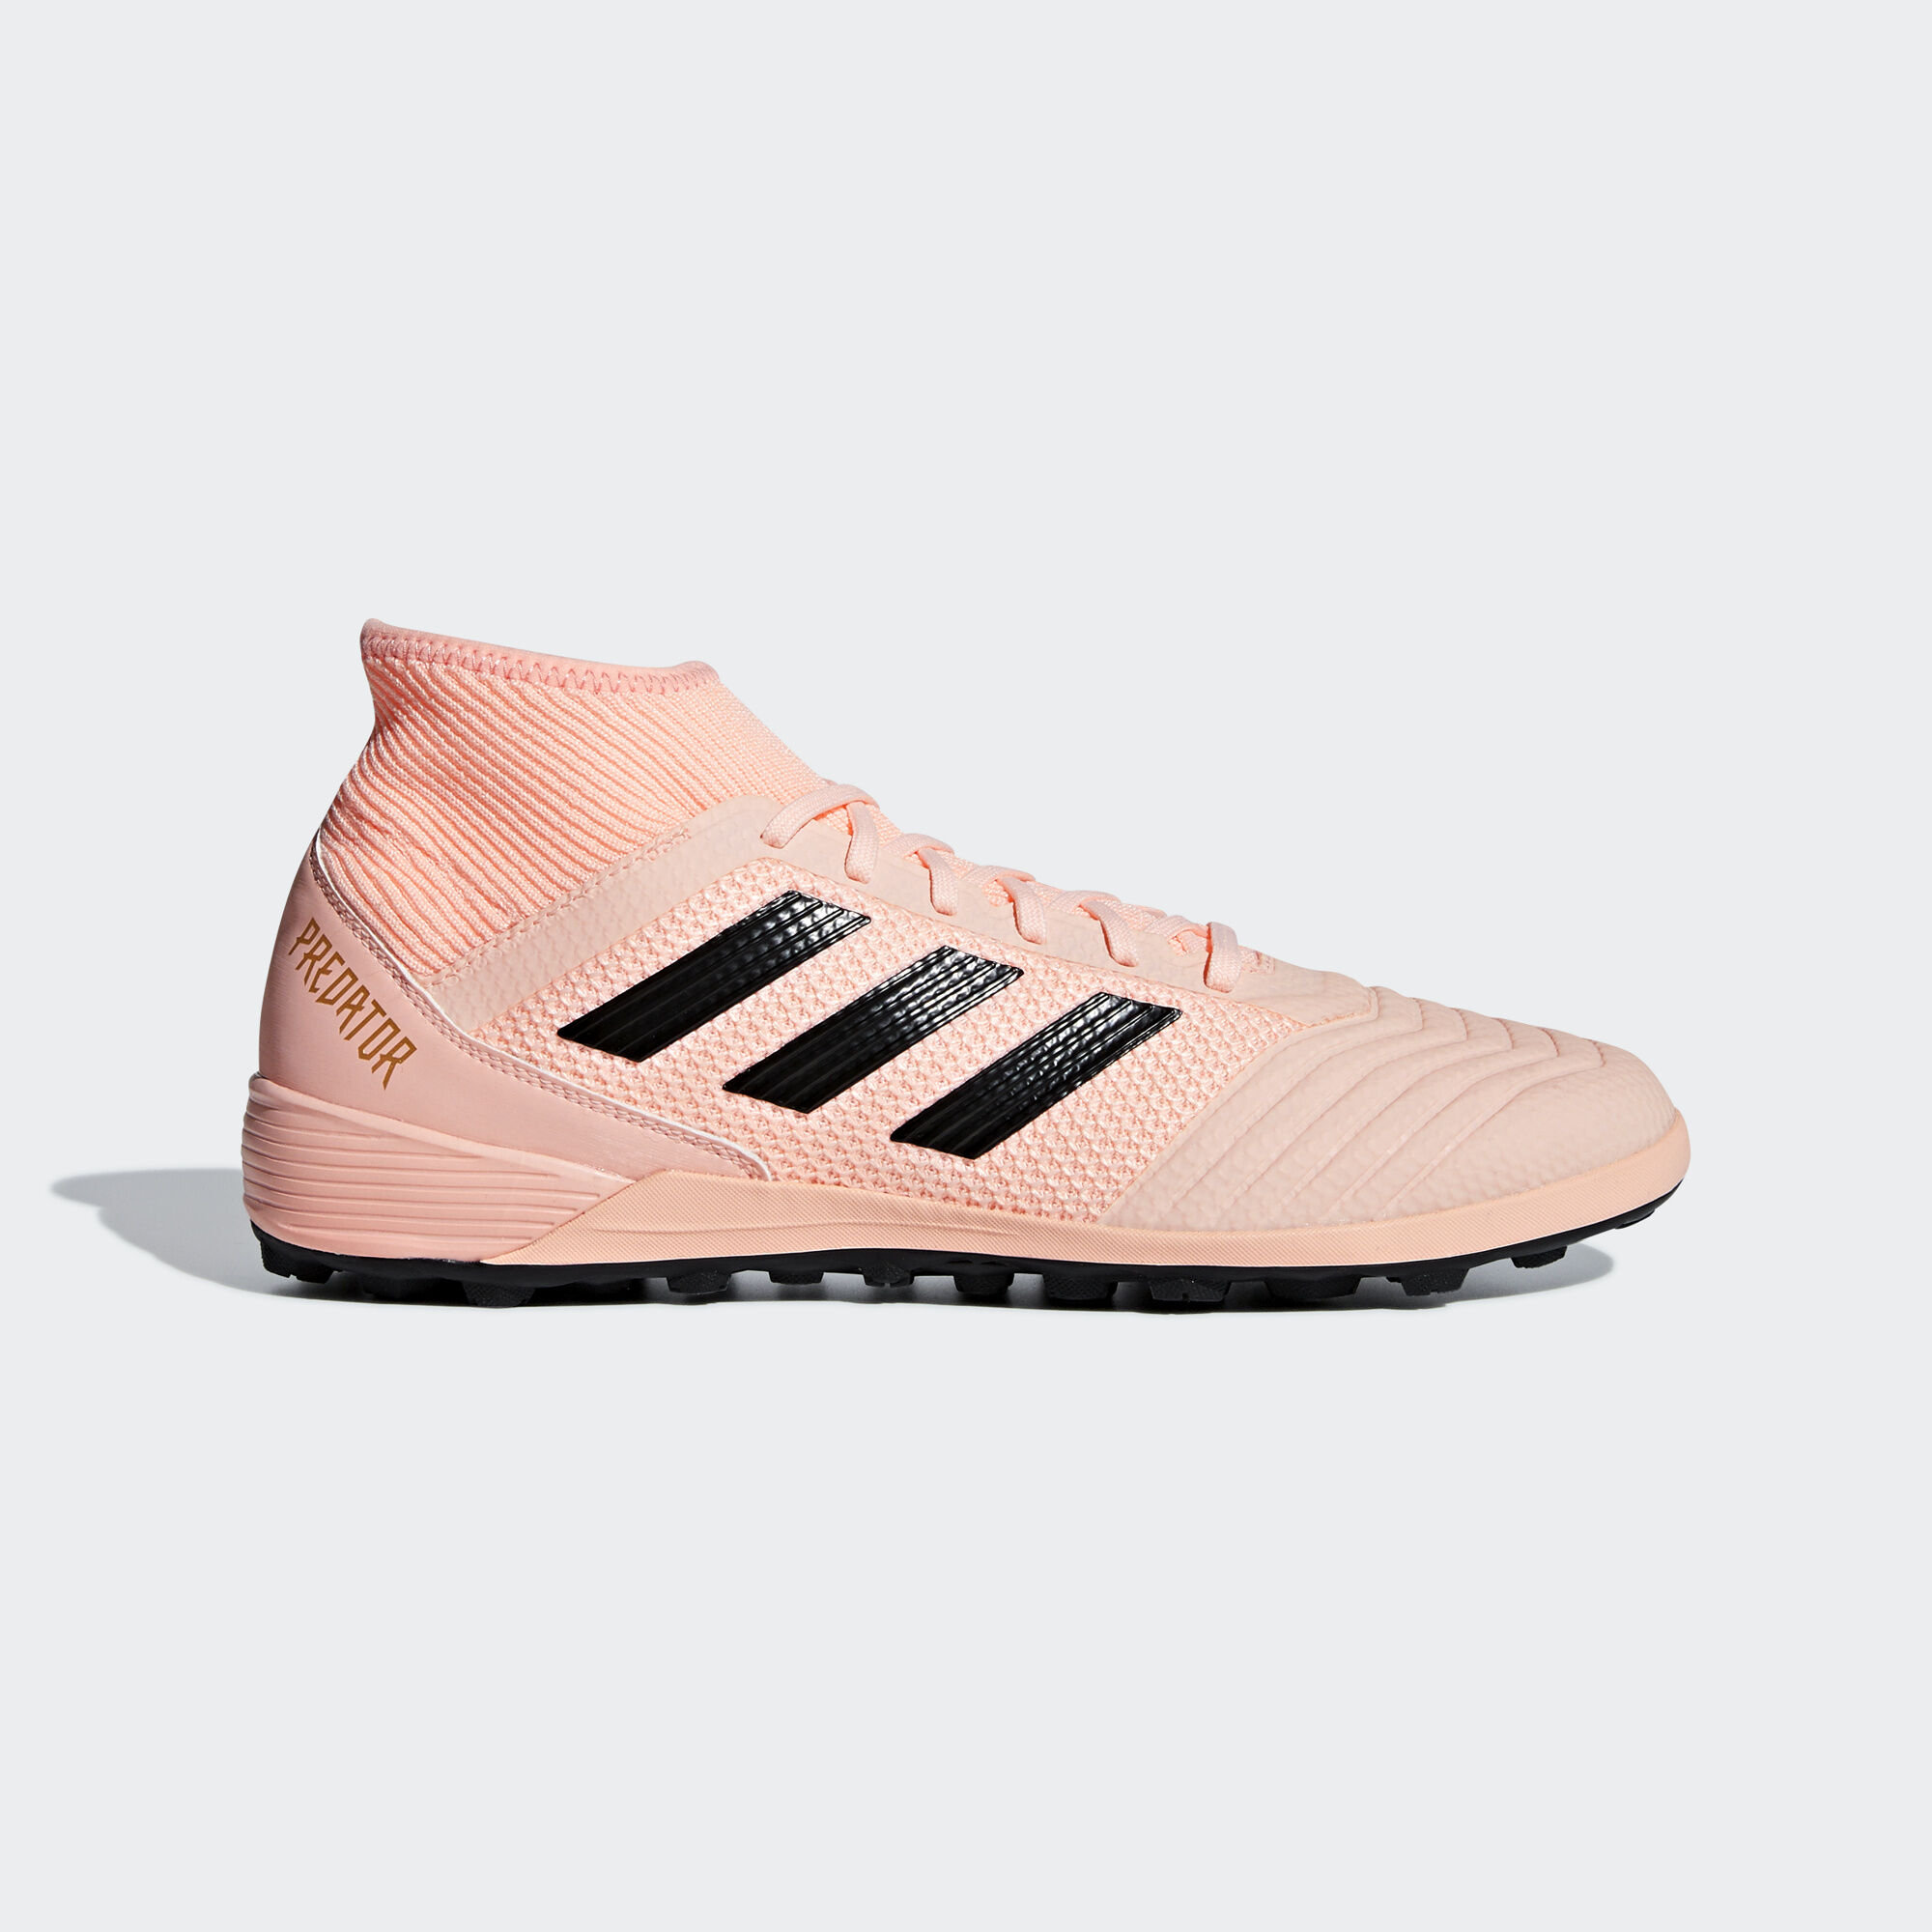 new arrivals 830fa 3f8b9 adidas - Predator Tango 18.3 Turf Boots Clear Orange   Core Black   Clear  Orange DB2132. Men Football